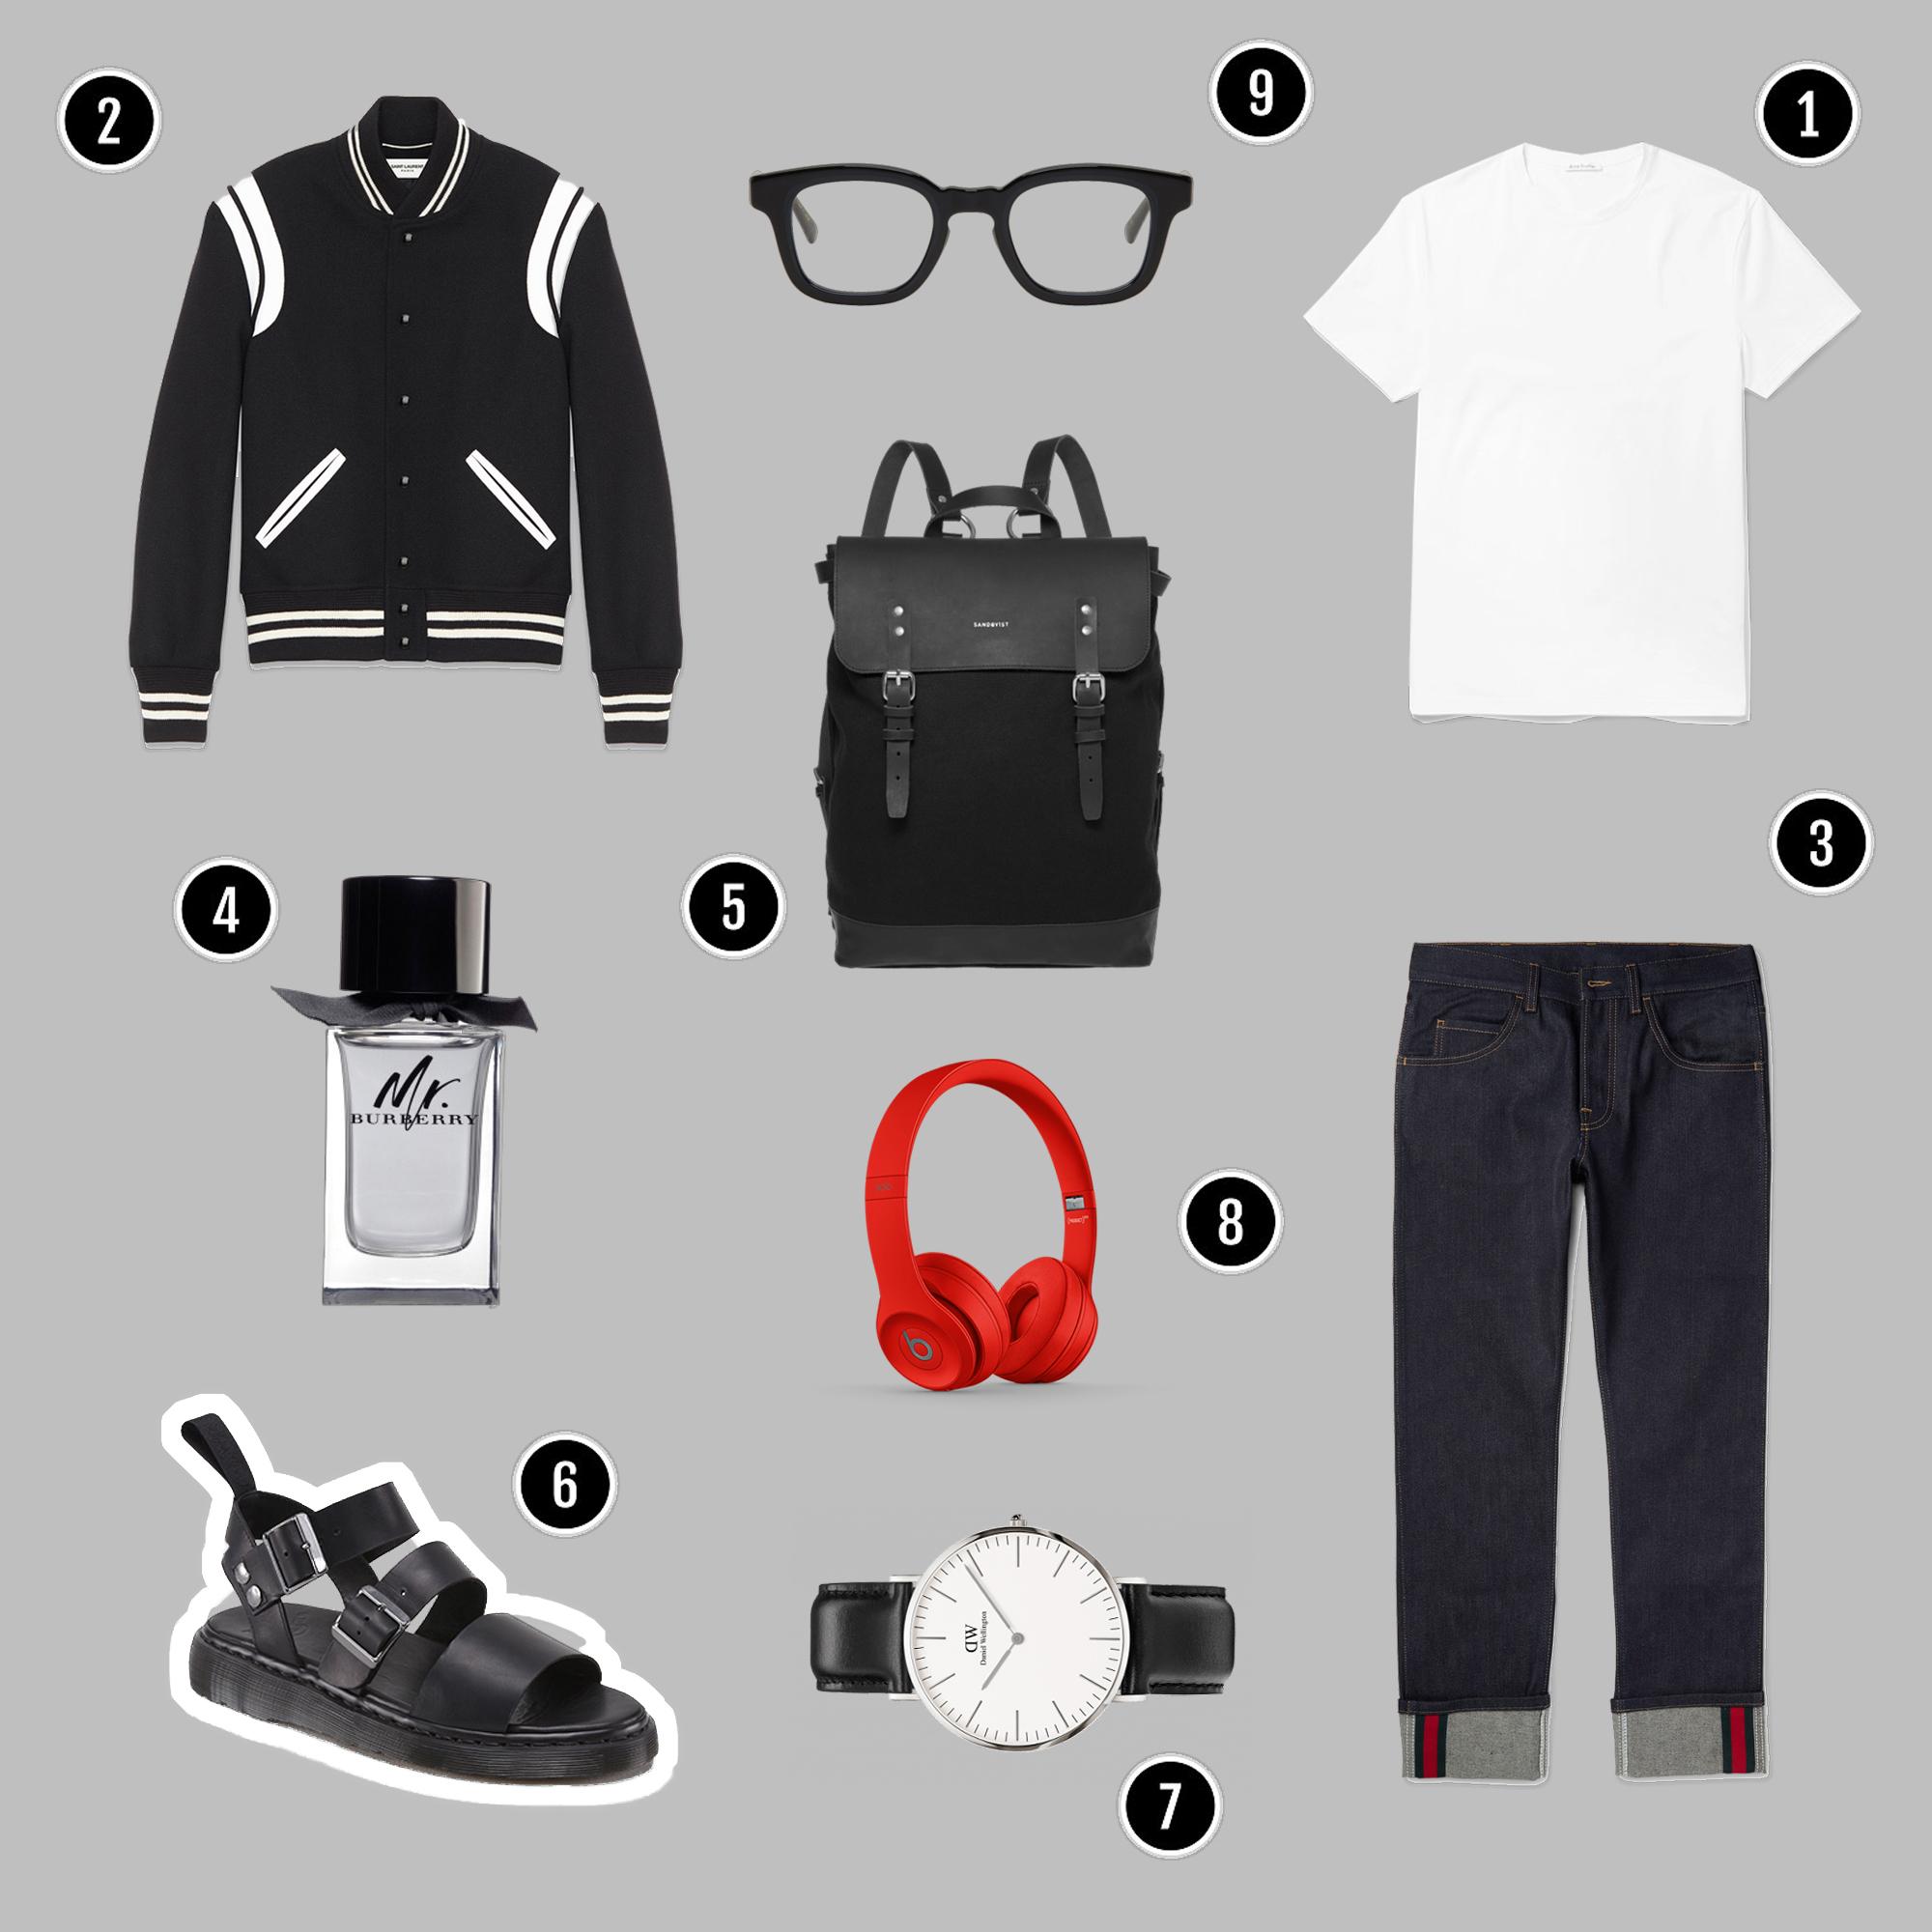 1.Áo thun : Acne Studios / 2.Áo khoác : Saint Laurent / 3.Quần : Gucci / 4.Nước hoa : Mr. Burberry / 5.Túi : Sanqvist / 6.Sandals : Dr.Martens / 7.Đồng hồ : DW / 8.Headphones : Beats / 9.Kính : Eyevan 7285